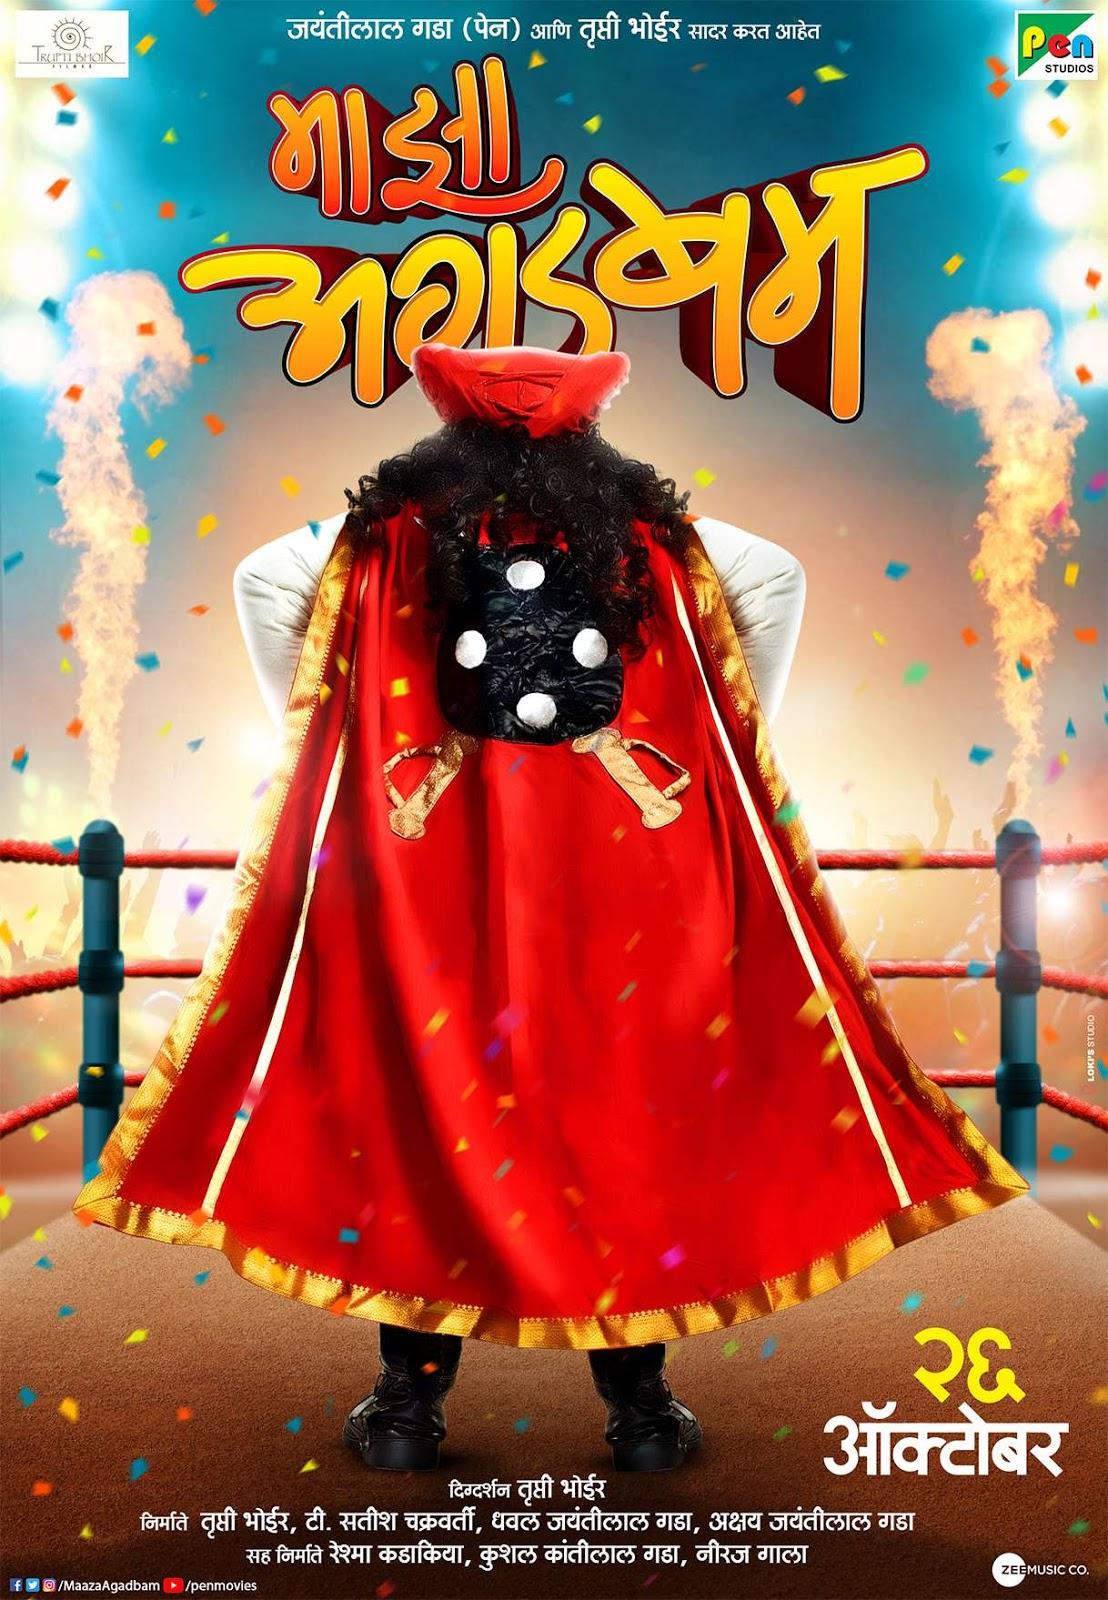 अगडबम ची नाजुका परतली - मराठी चित्रपट | Agadbam Chi Najuka Paratali - Marathi Movie